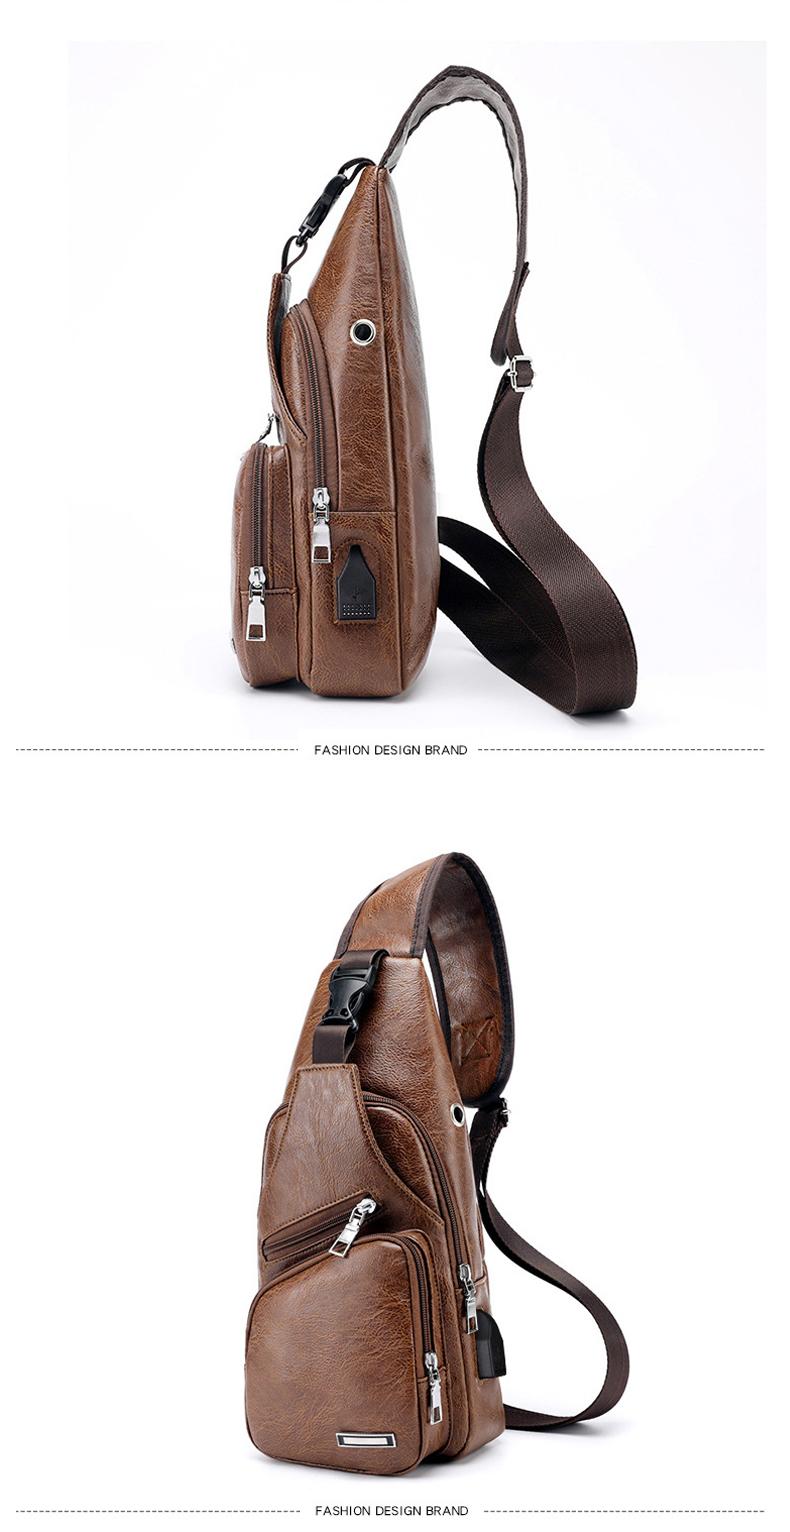 Men's Crossbody Bags Men's USB Chest Bag Designer Messenger bag Leather Shoulder Bags Diagonal Package 2019 new Back Pack Travel 5